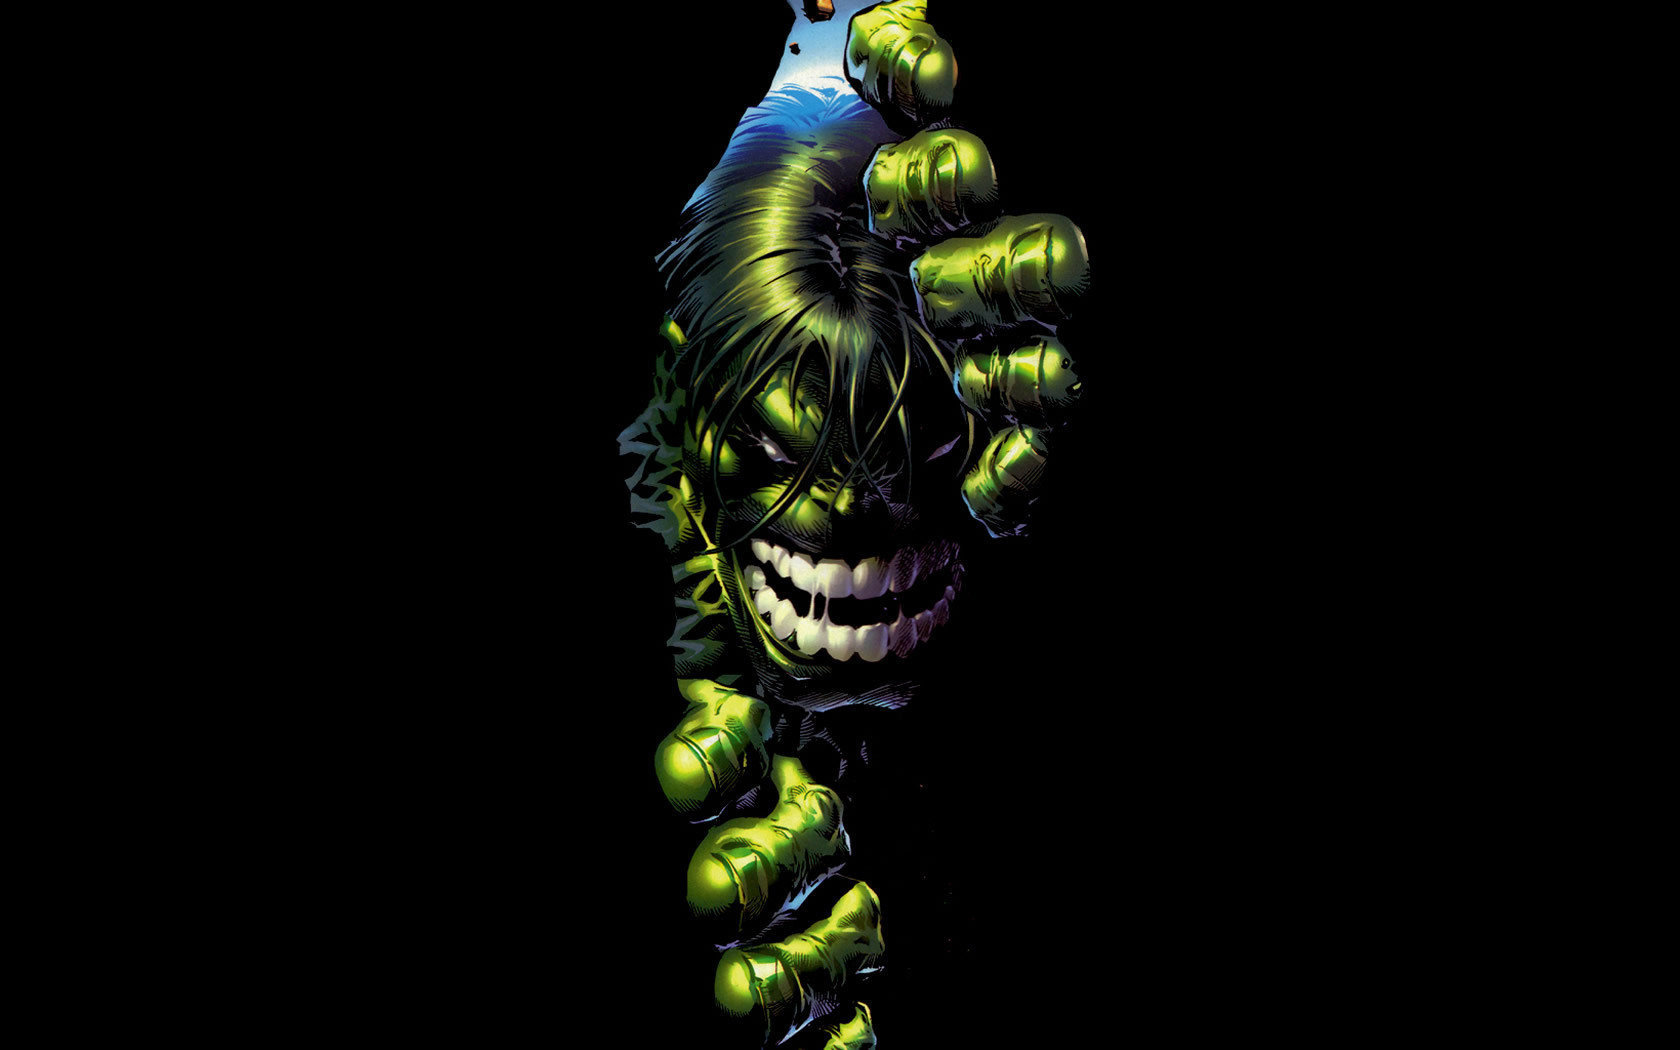 Hulk Wallpaper Hd For Pc